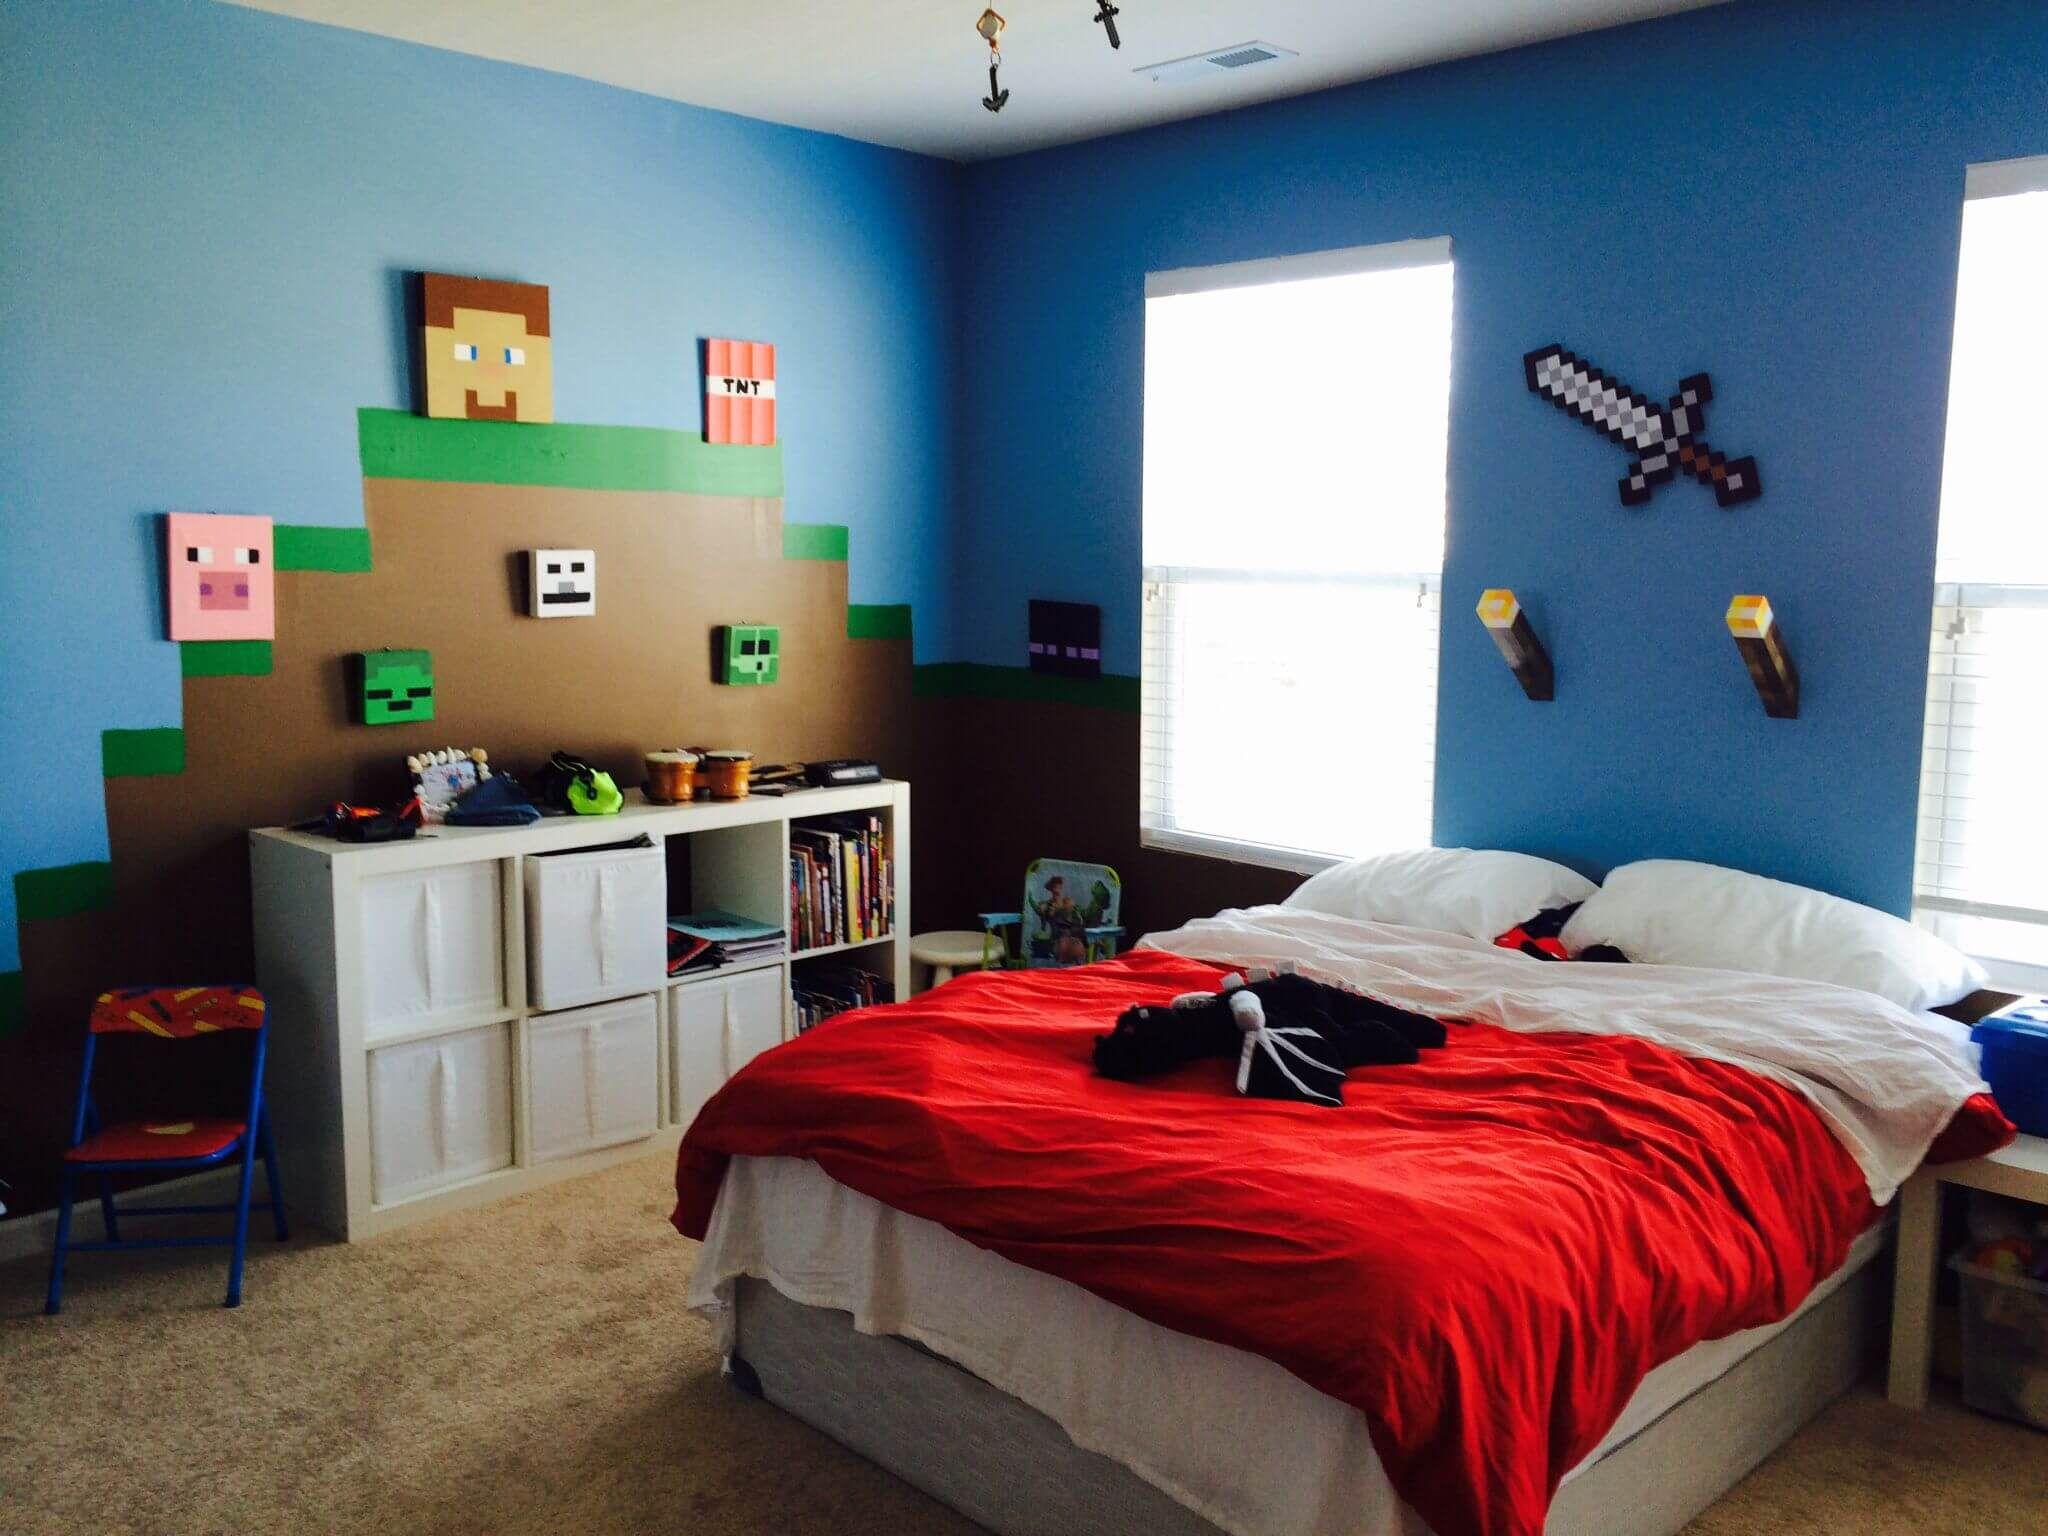 22 Minecraft Bedroom Ideas Taken From Pinterest The Architecture Designs Boy Bedroom Design Minecraft Room Bedroom Design